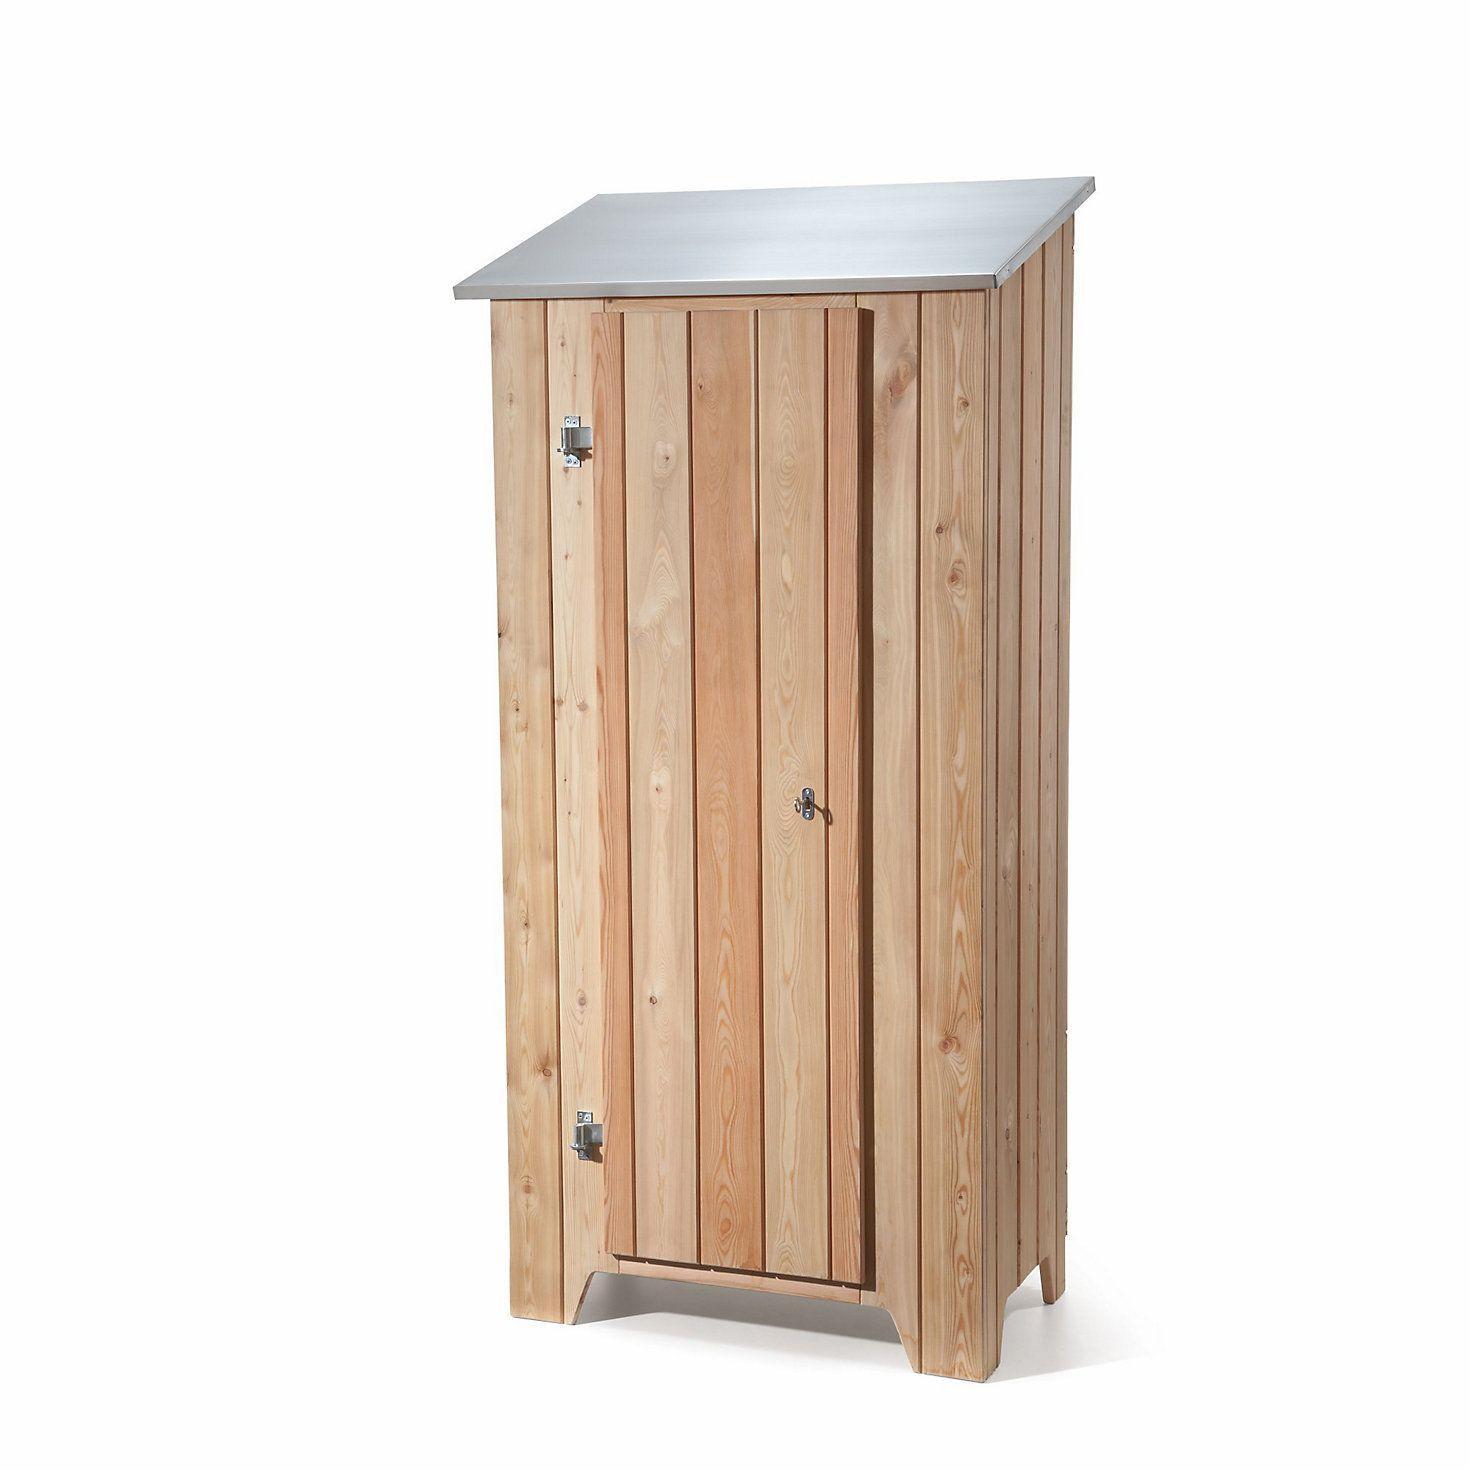 Gartenschrank Lärchenholz